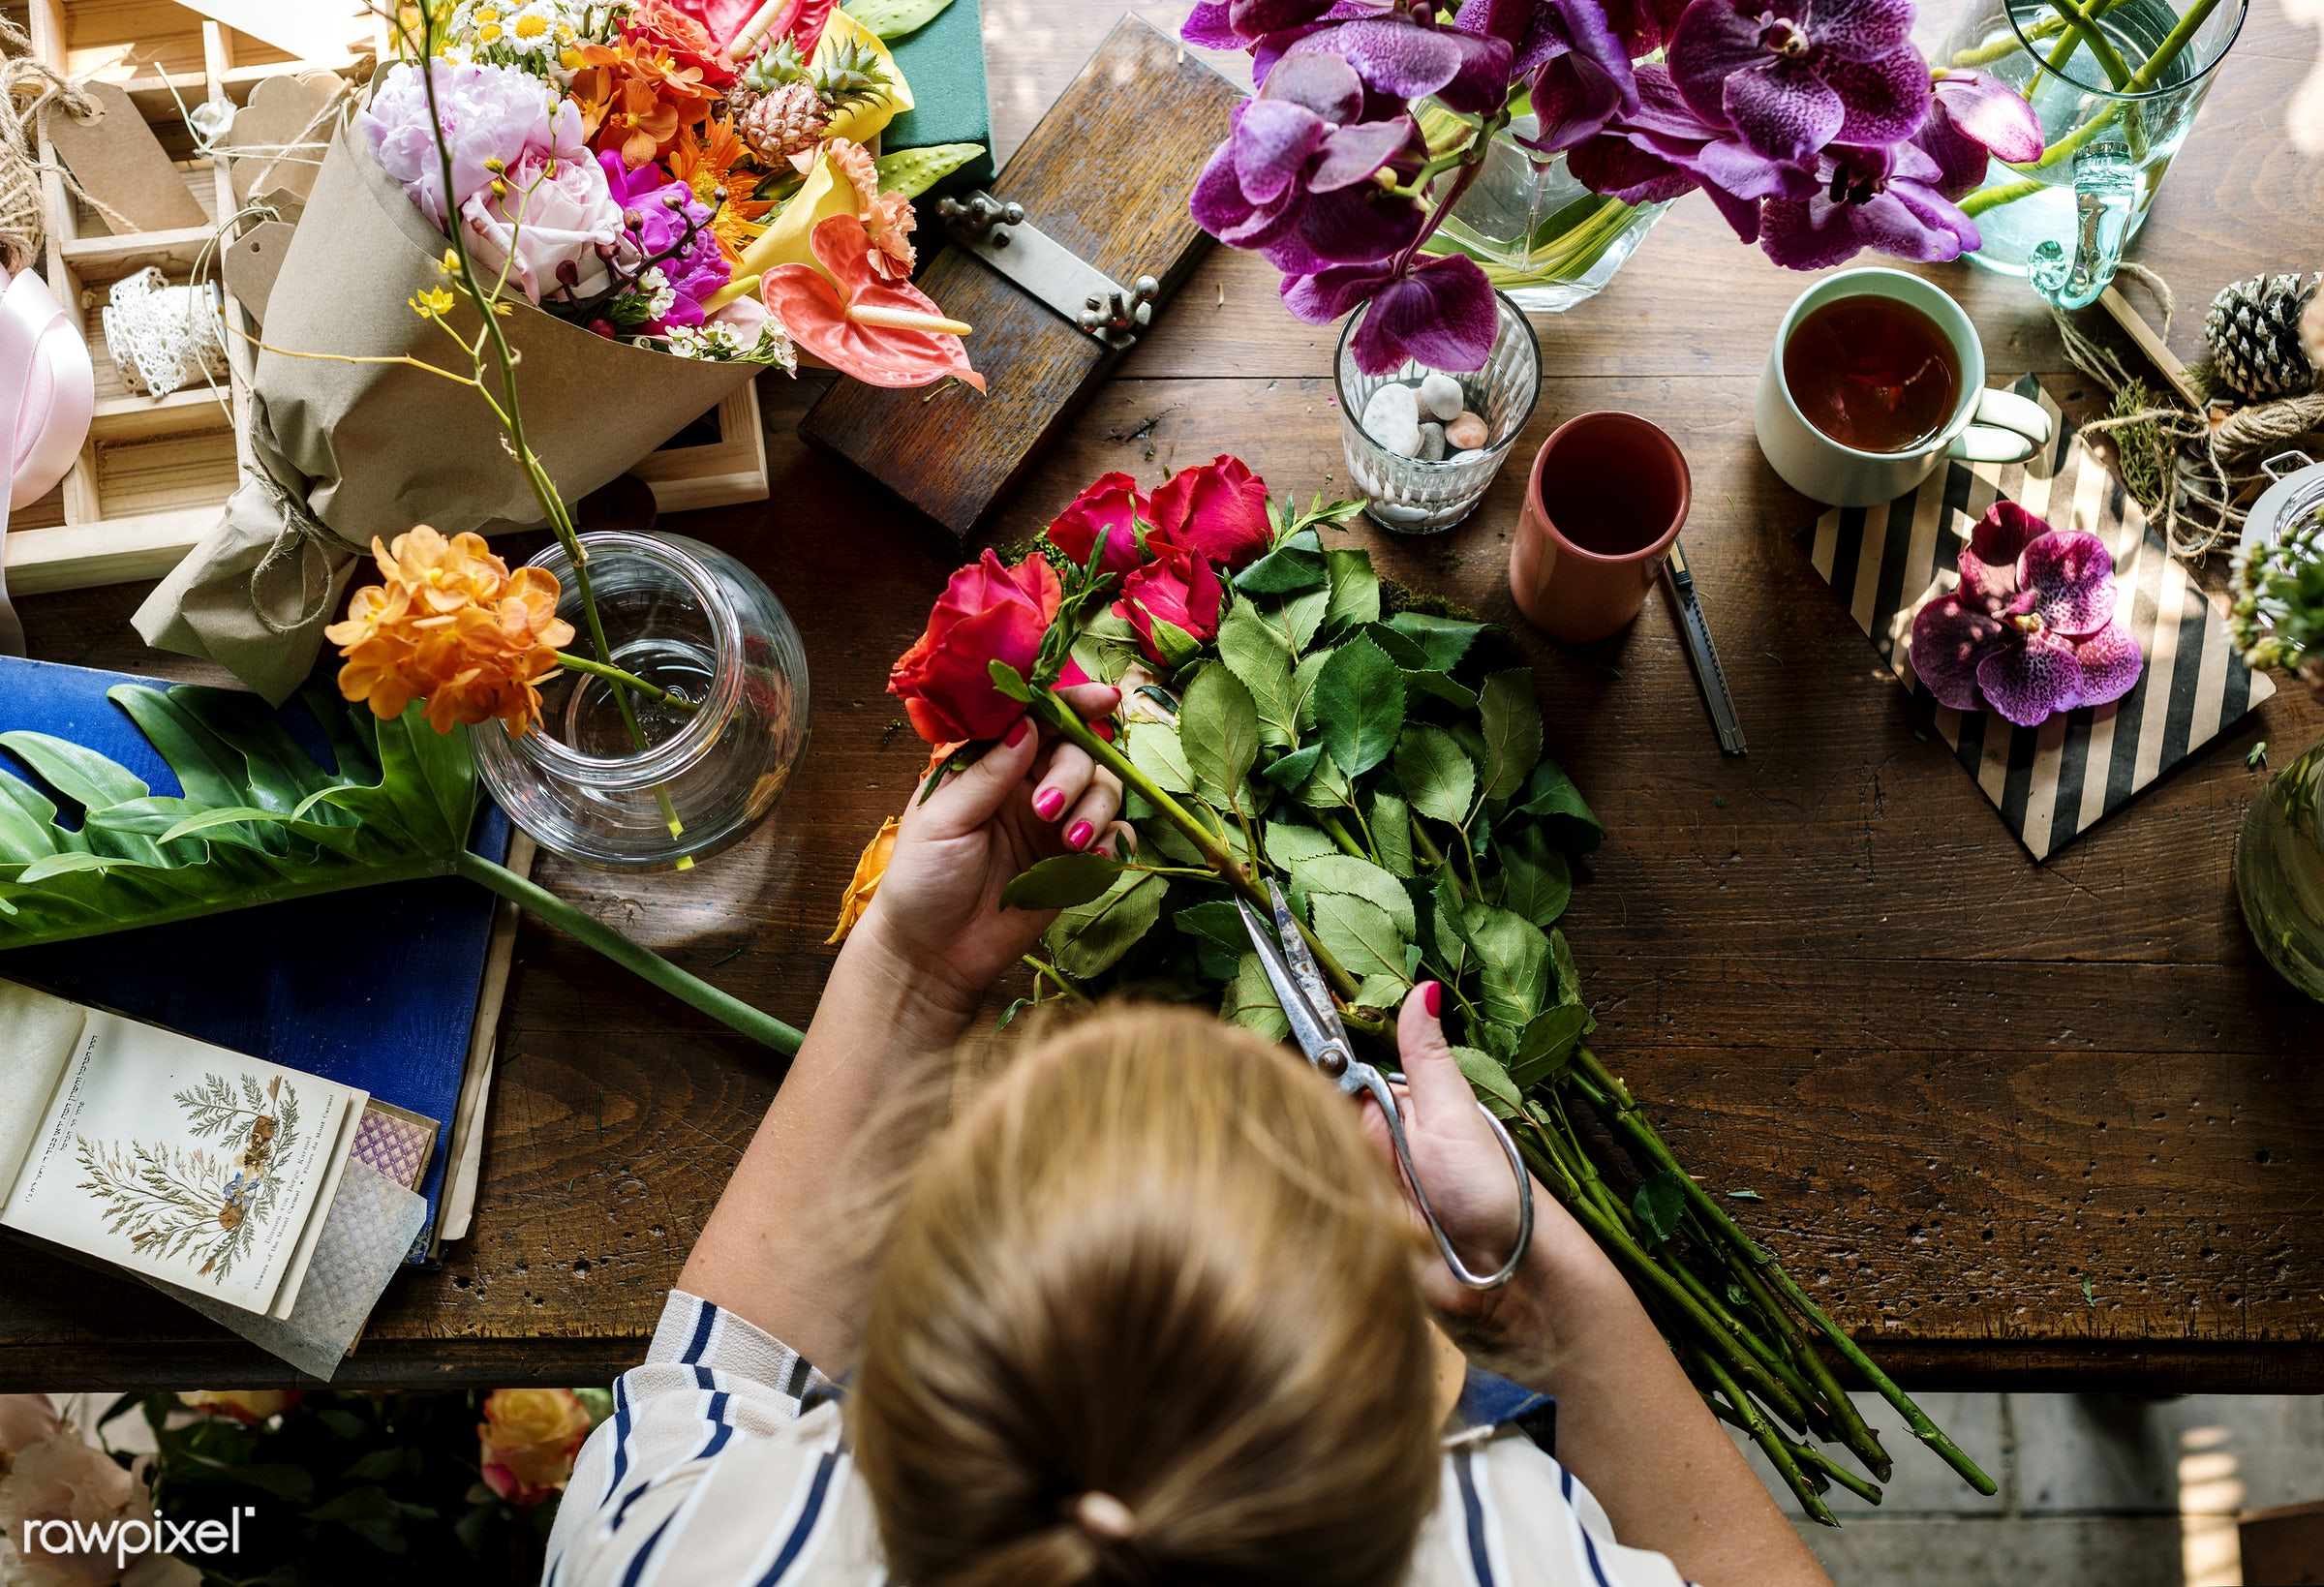 plant, bouquet, person, fresh, woman, aerial view, flower, decoration, flora, refreshment, leisure, table, cutting, florist...